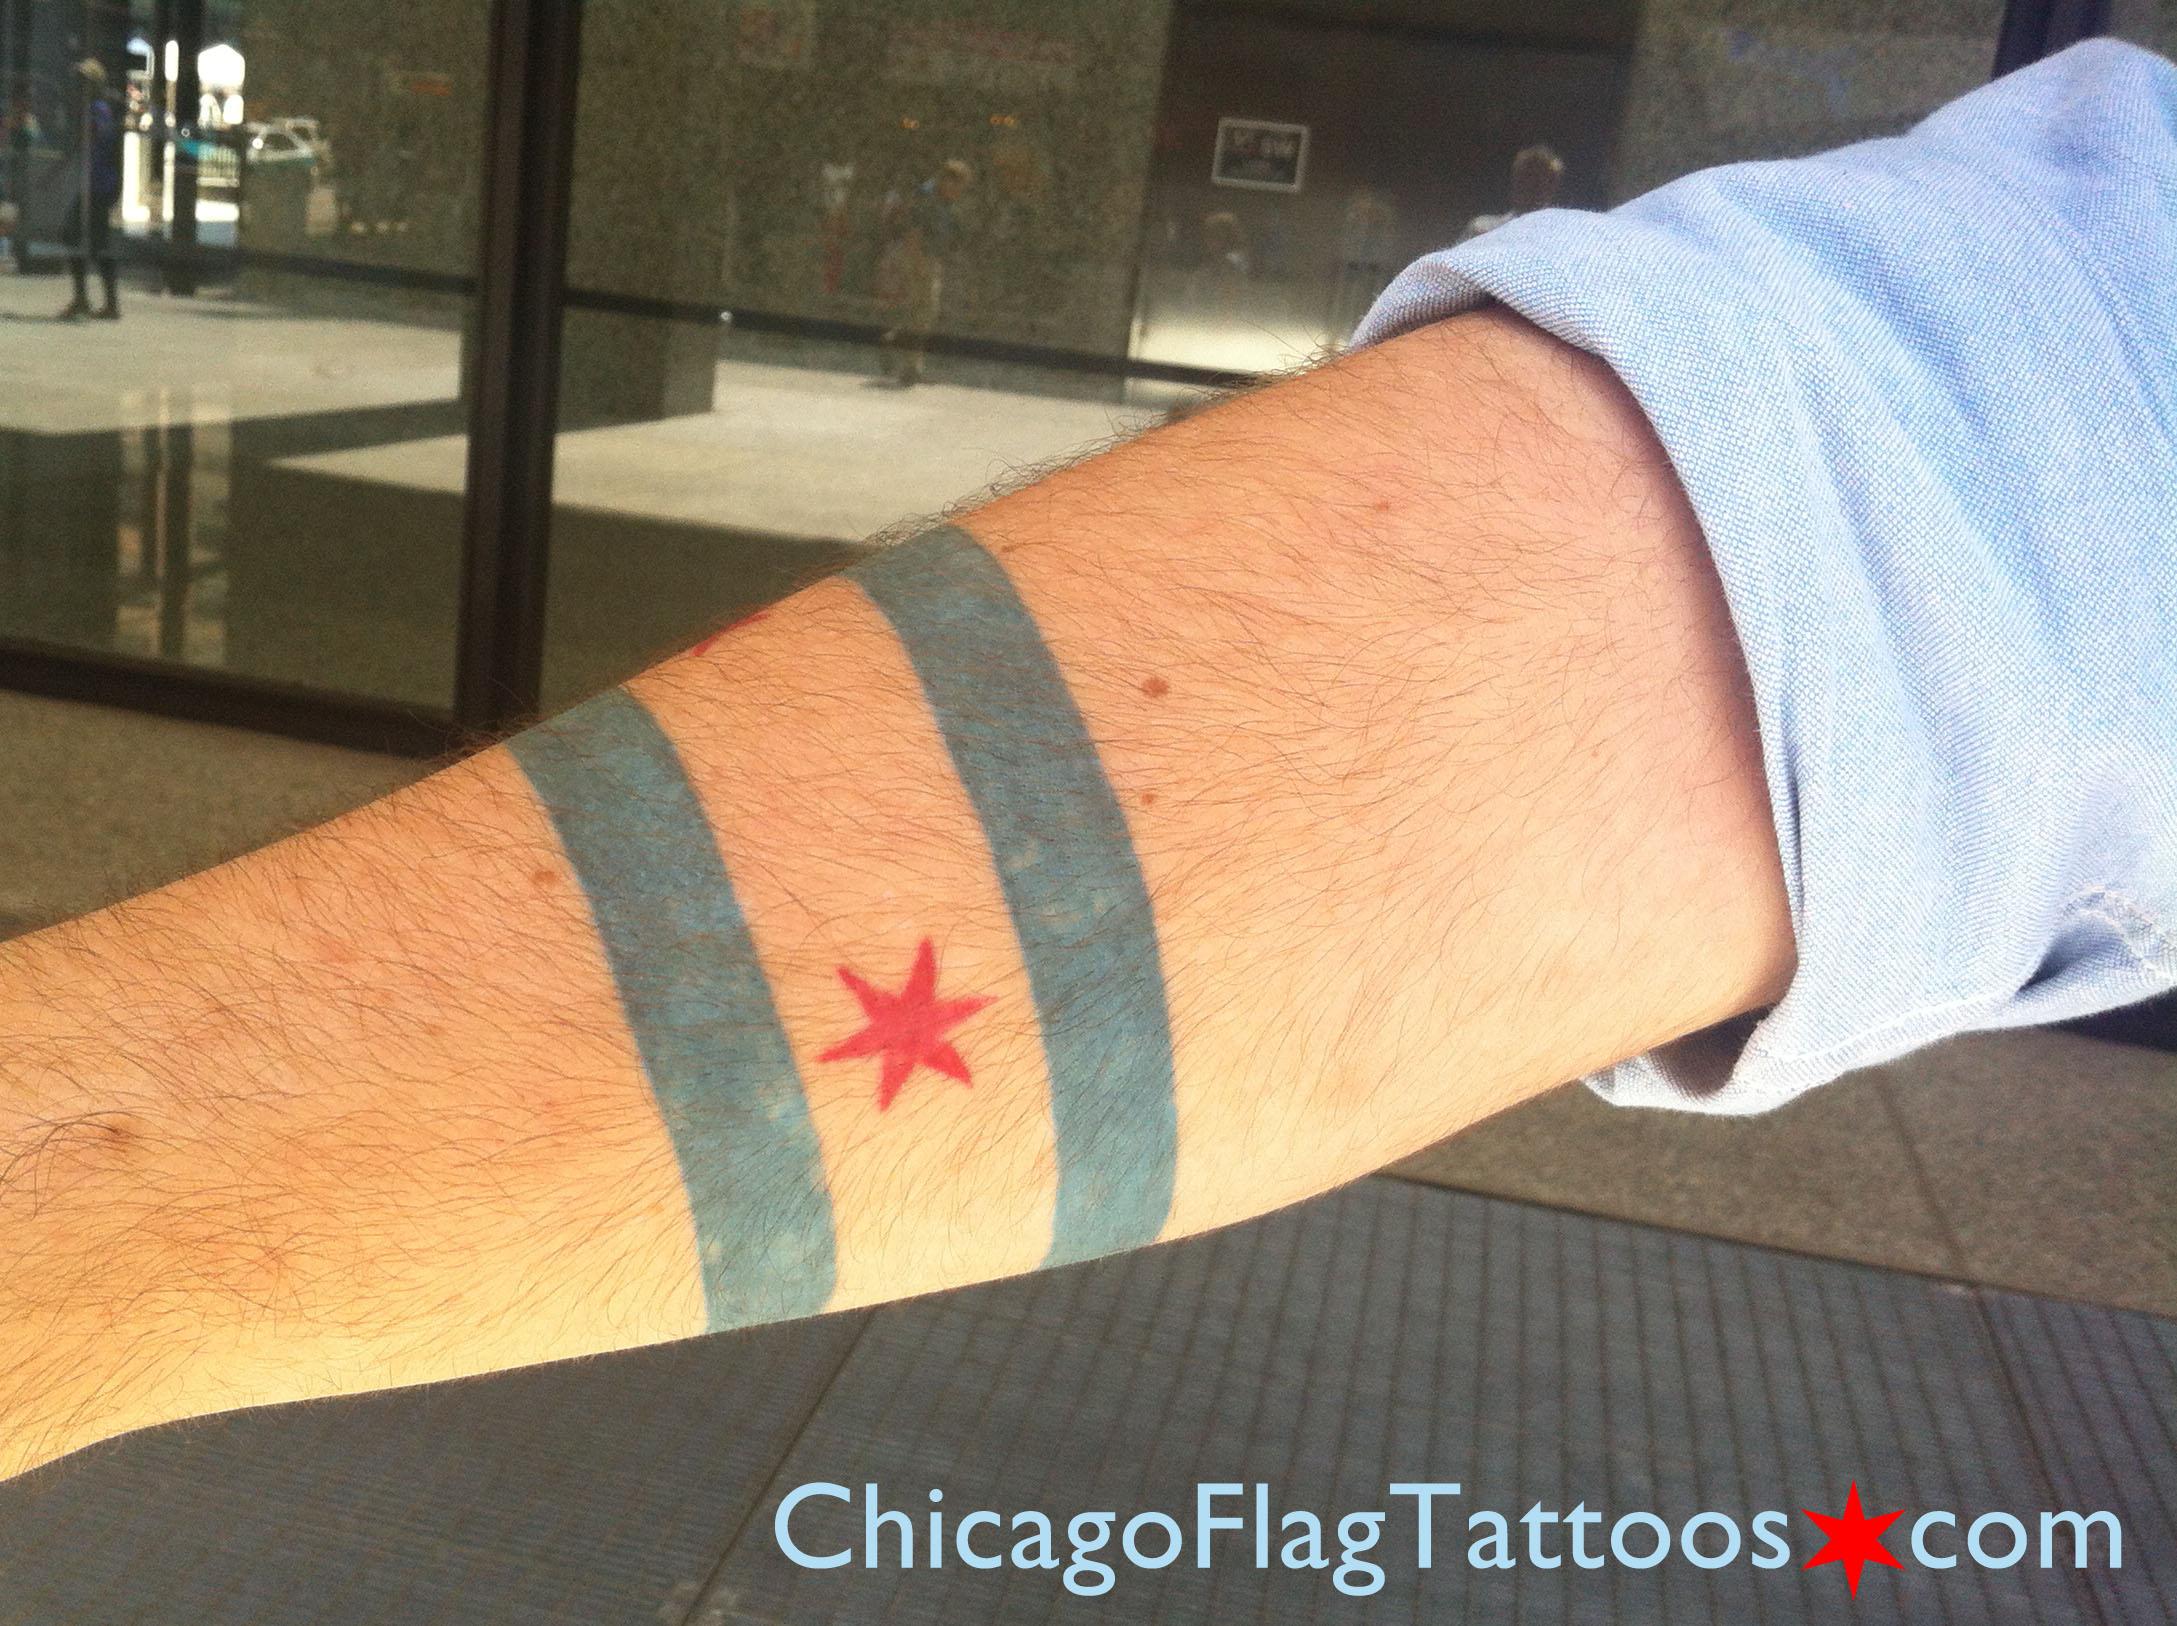 http://chicagoflagtattoos.com/img/ben-folgers-tattoo.jpg